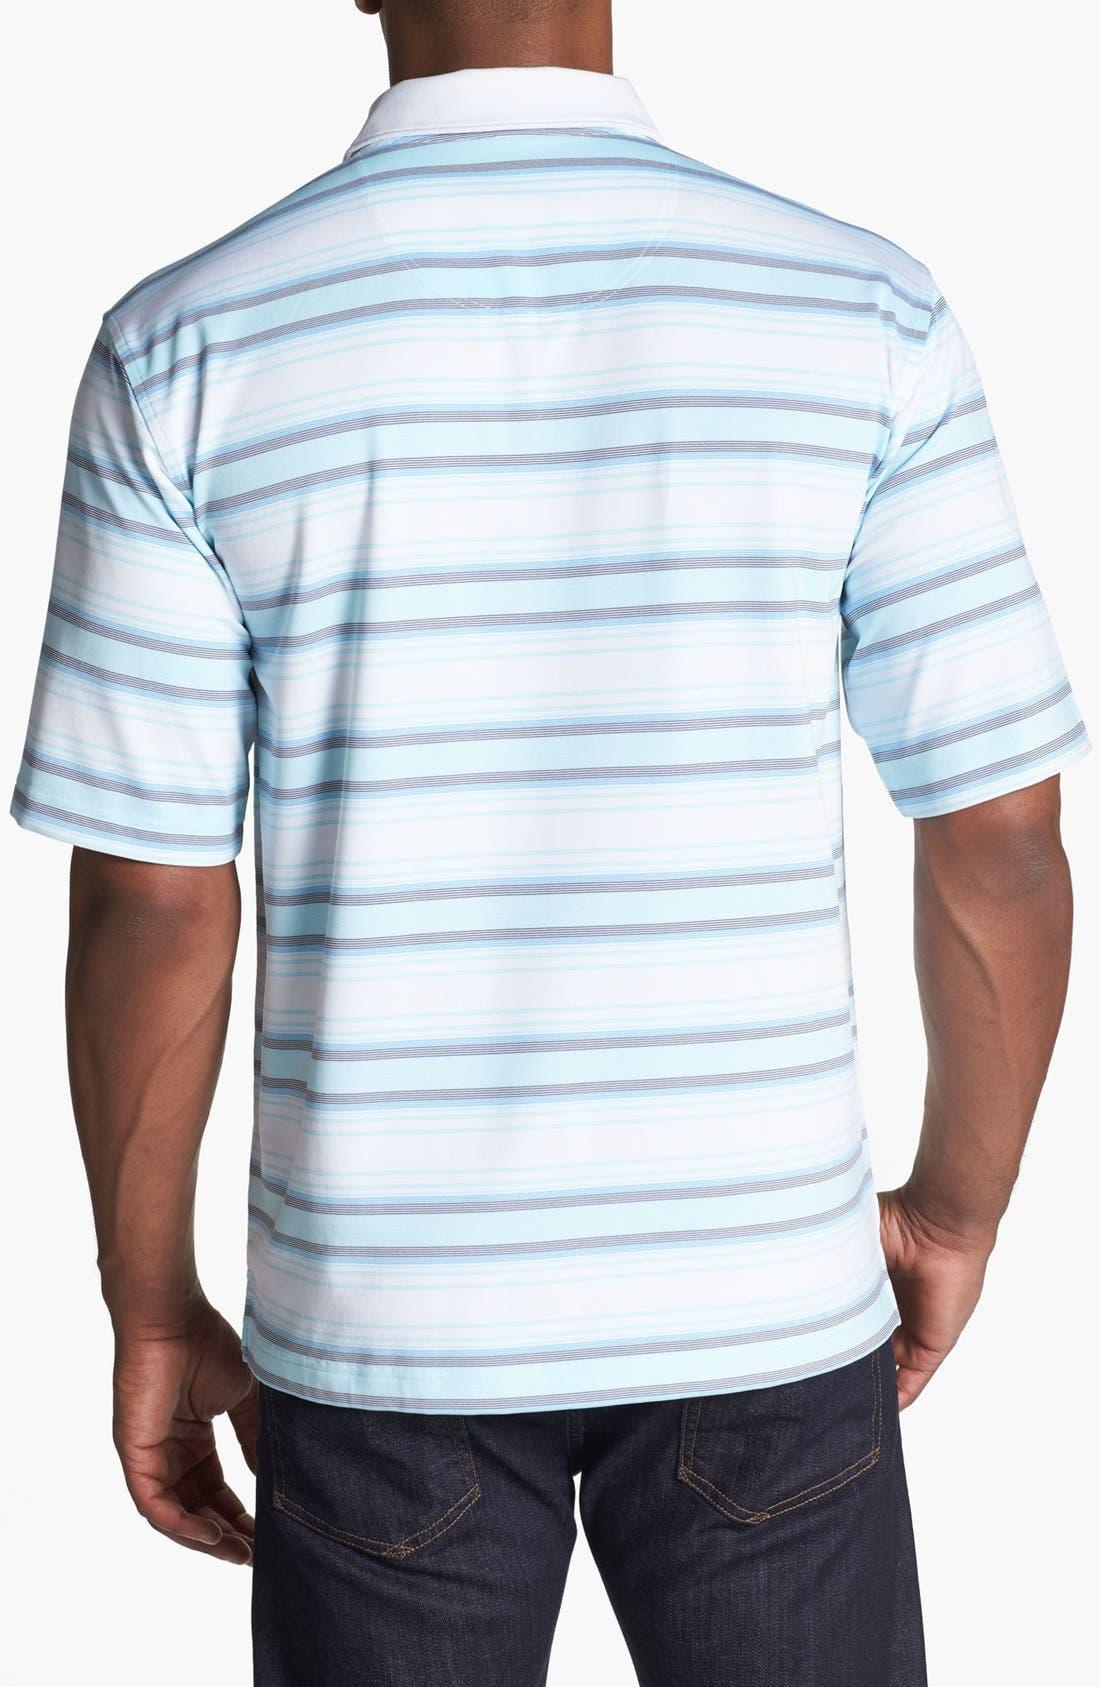 Alternate Image 2  - Lone Cypress Pebble Beach Striped Polo Shirt